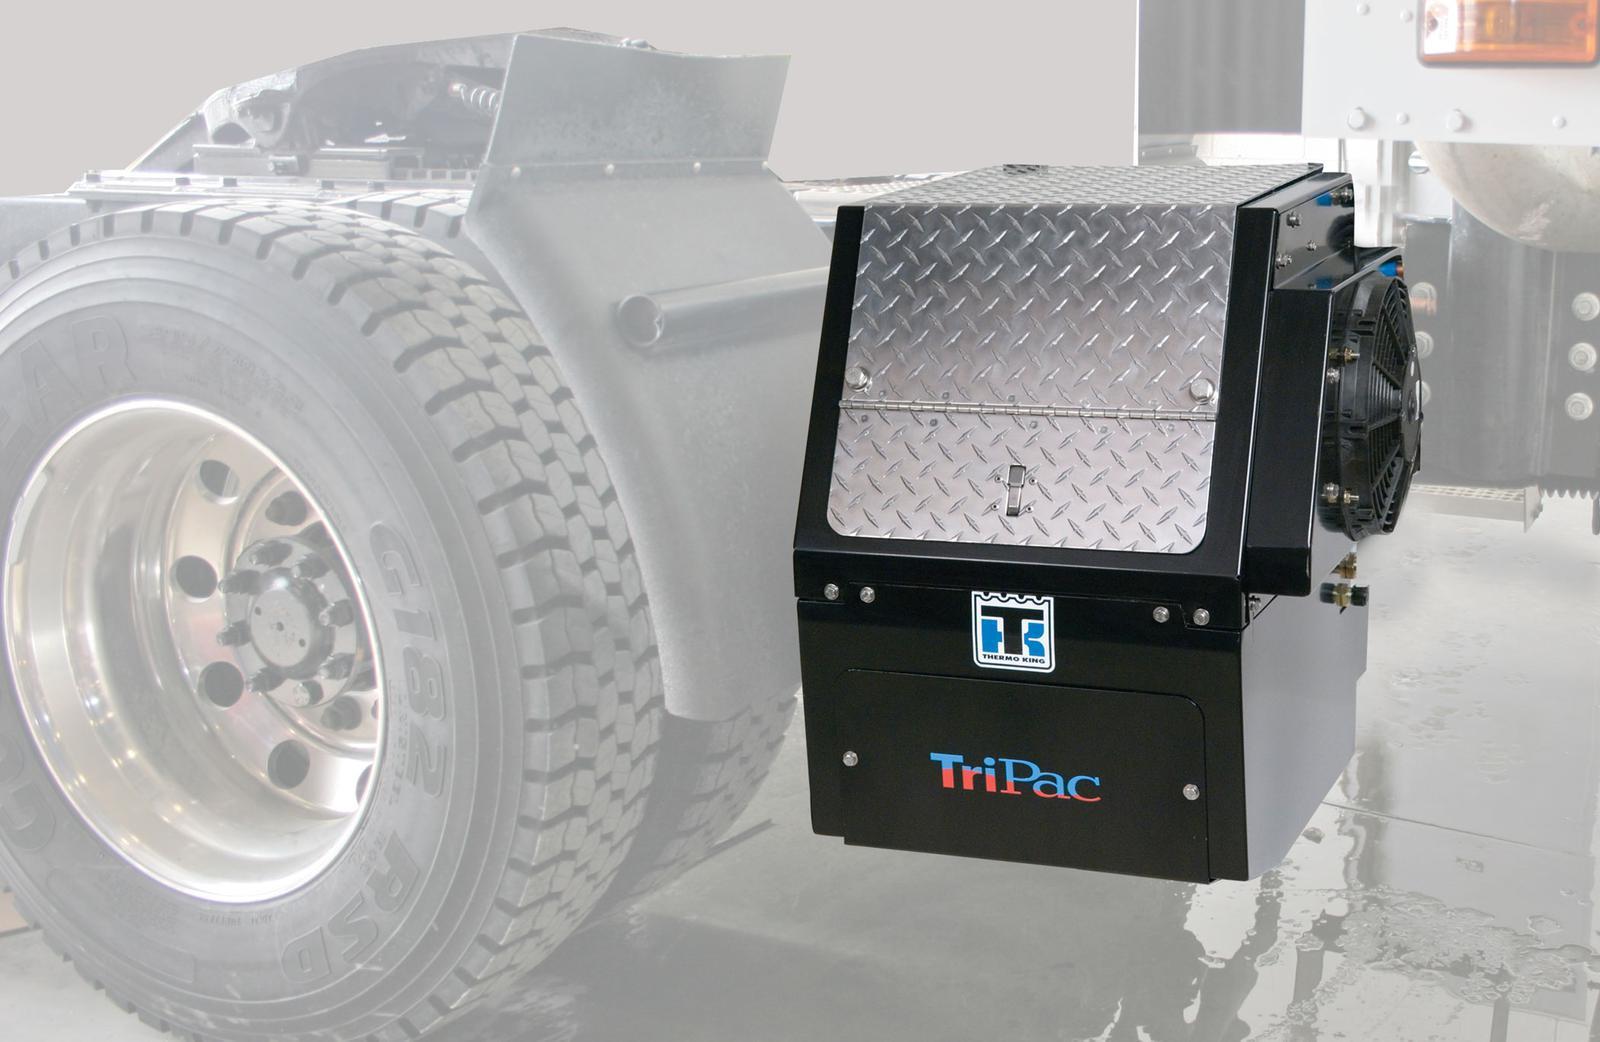 tripac auxiliary power units apu thermo king northwest kent wa rh tknw com thermo king apu service manual thermo king apu parts manual